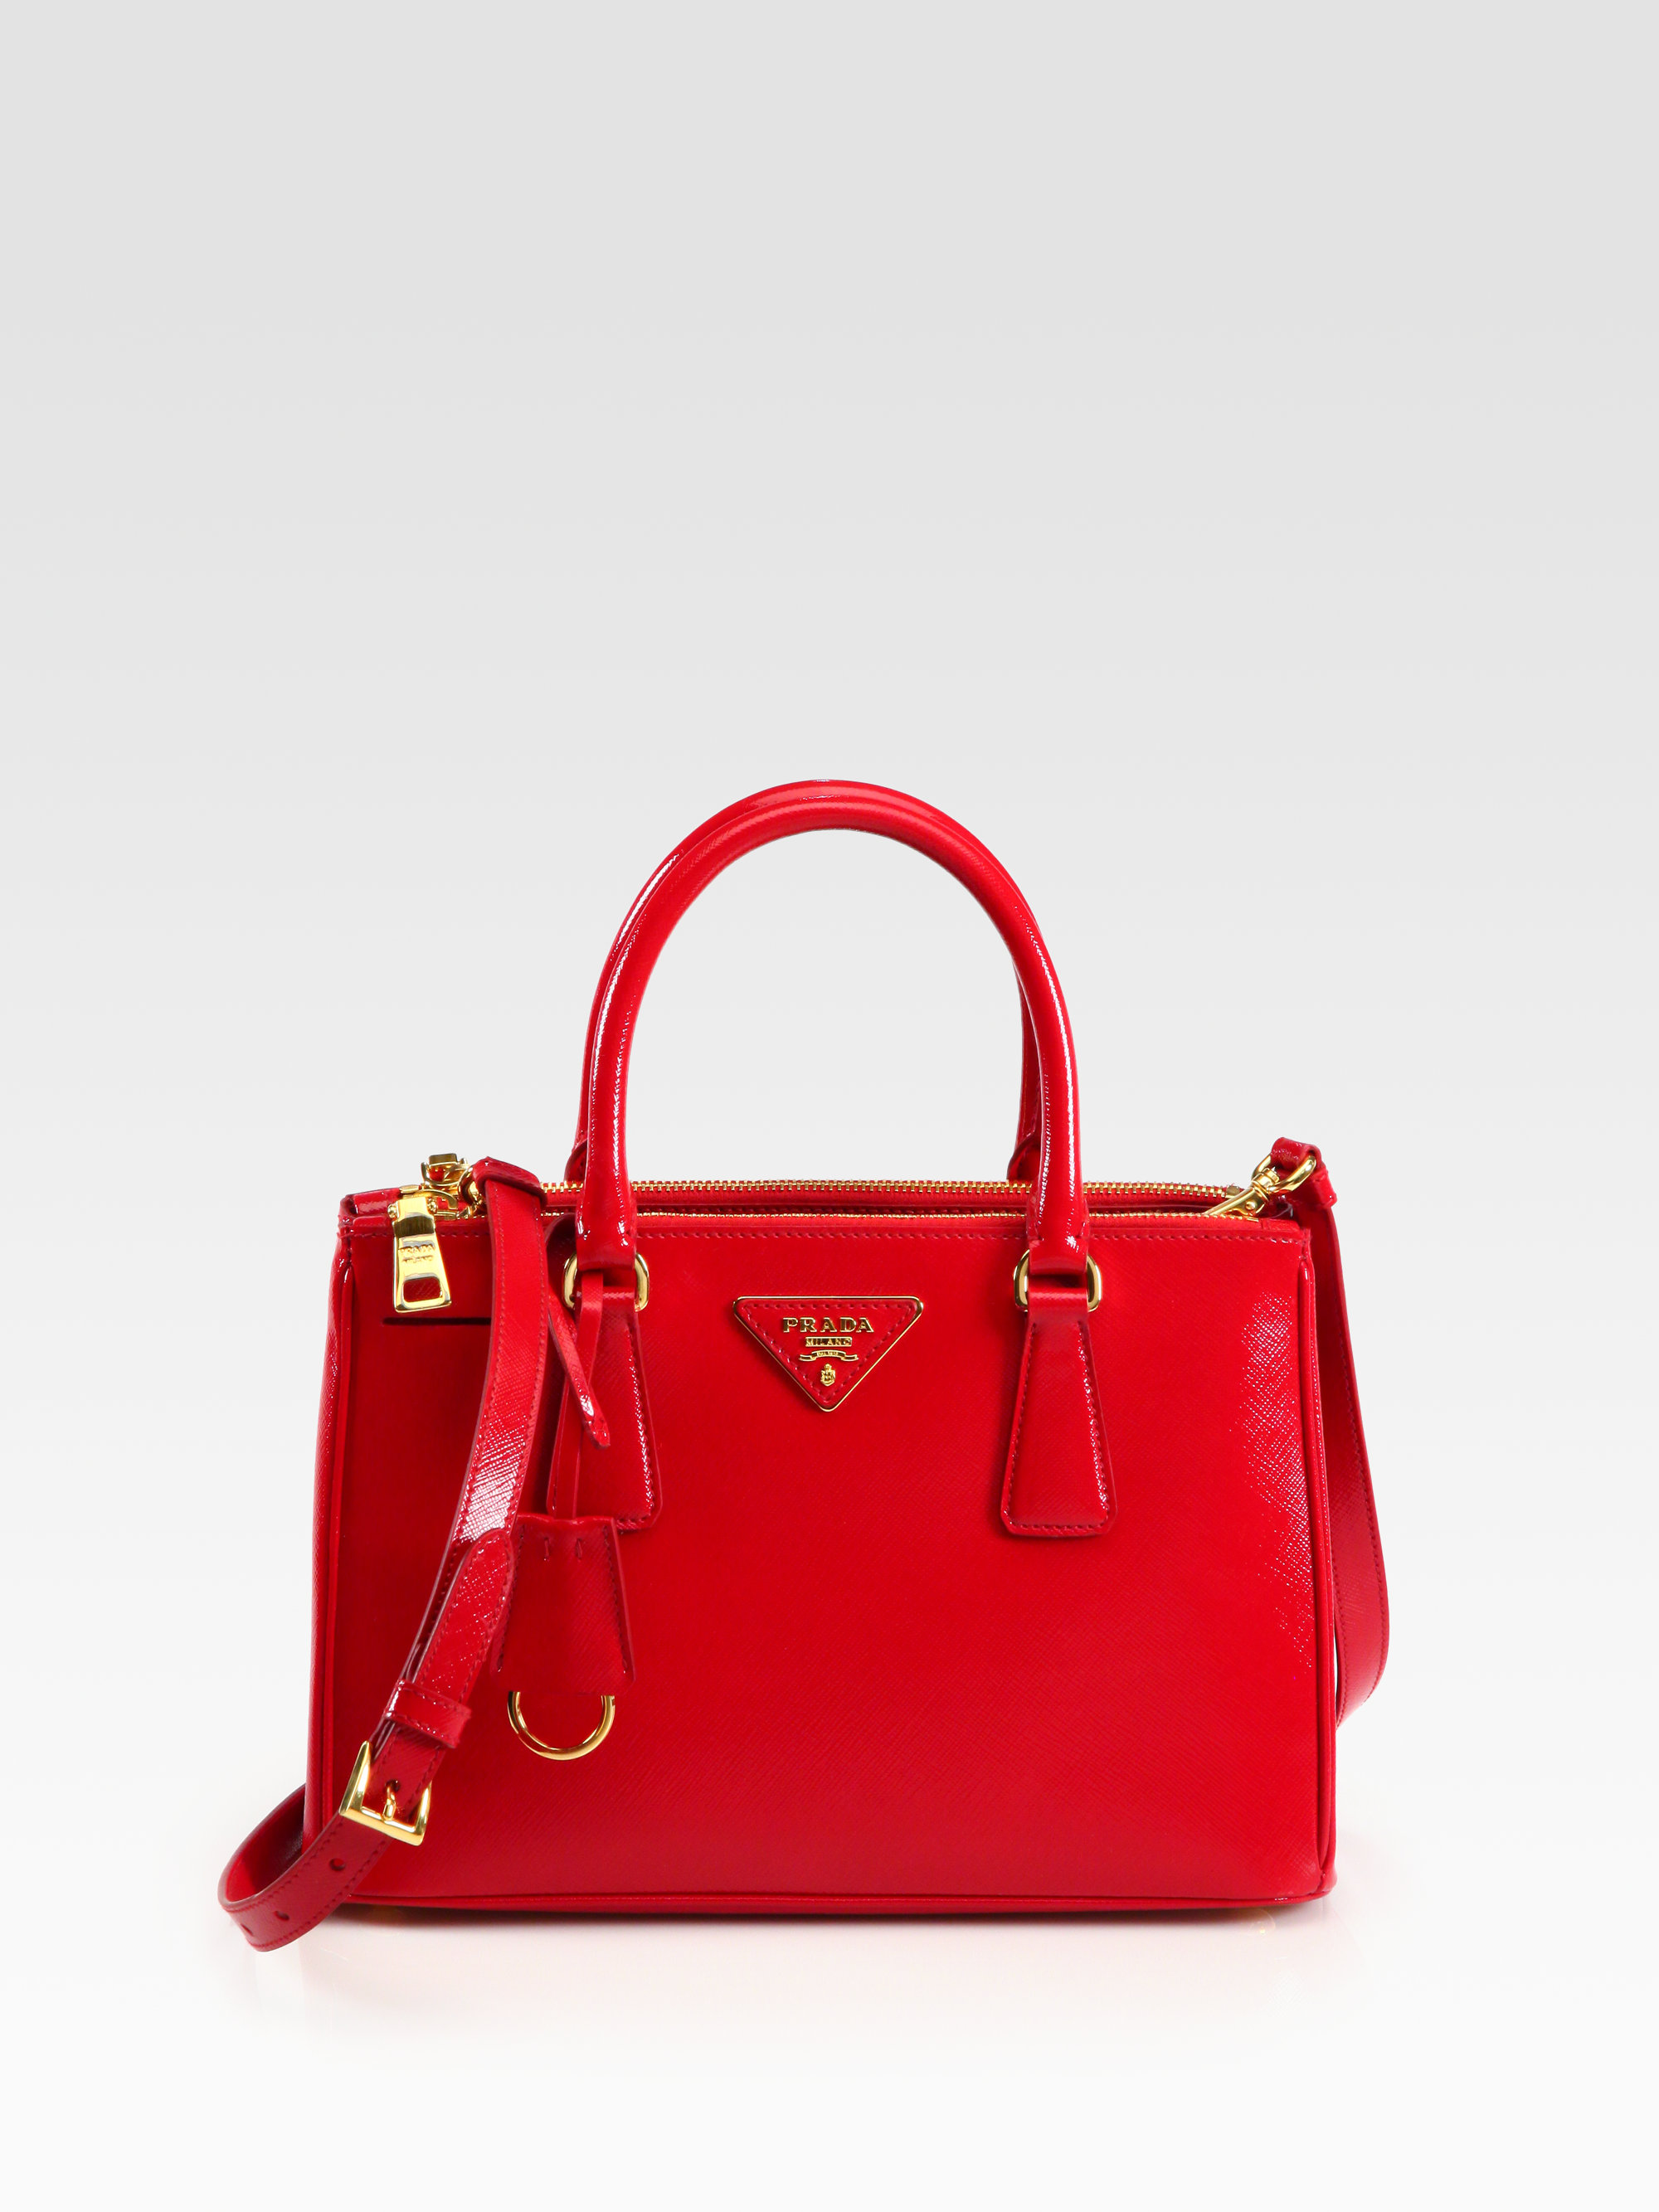 f46cf54a3b5f ... where to buy lyst prada saffiano vernice tote in red 9d4e6 98a25